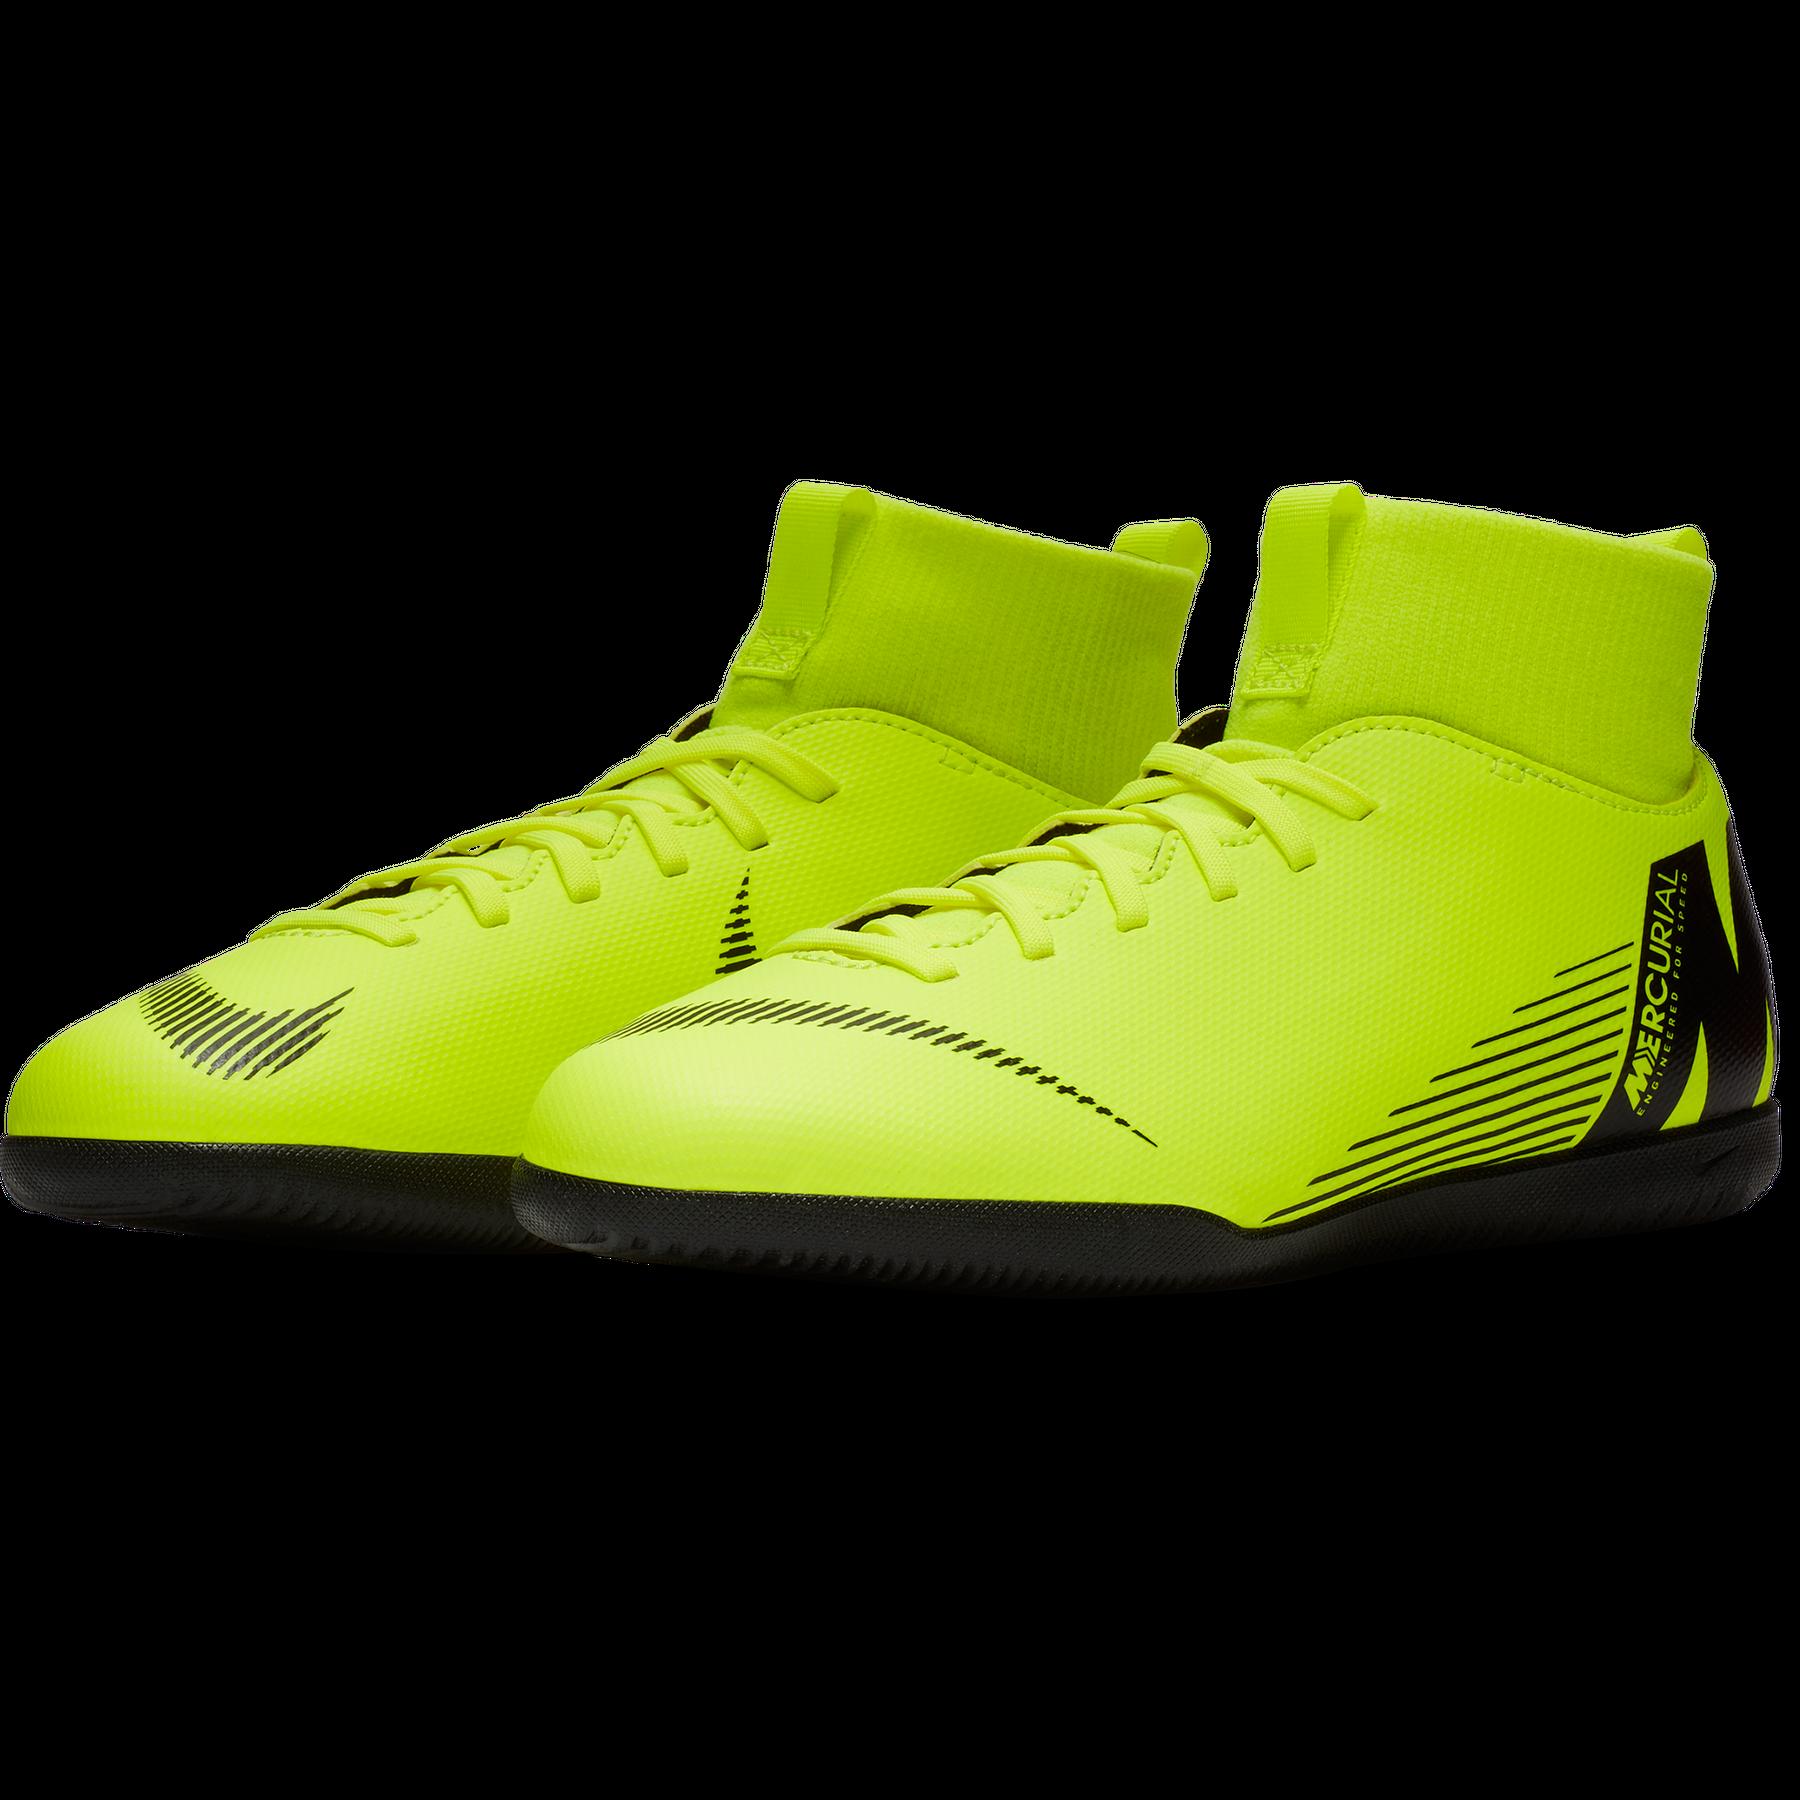 big sale 3b8ab e8745 Nike Superfly 6 Club IC Hallenschuhe Kinder gelb